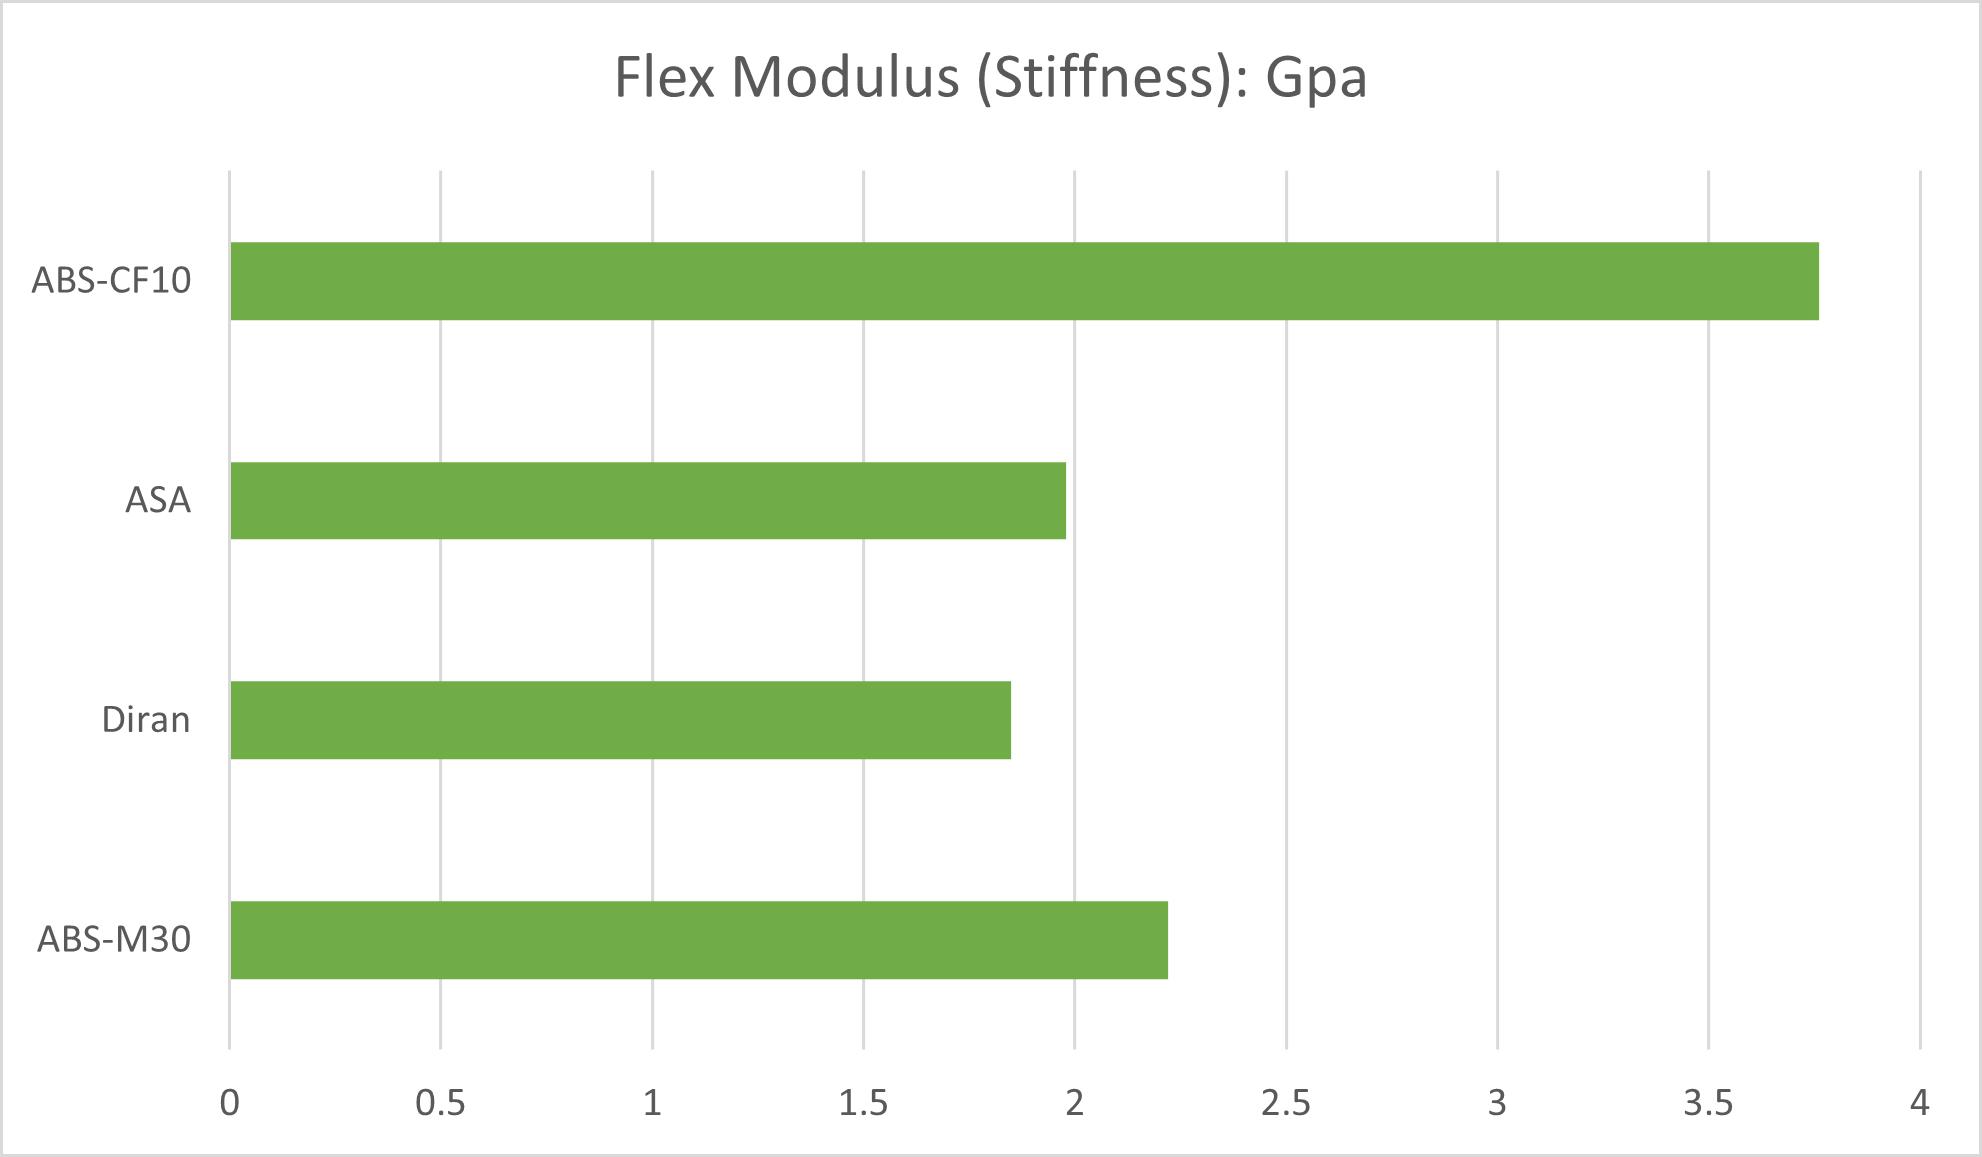 Flex Modulus Stiffness GPA